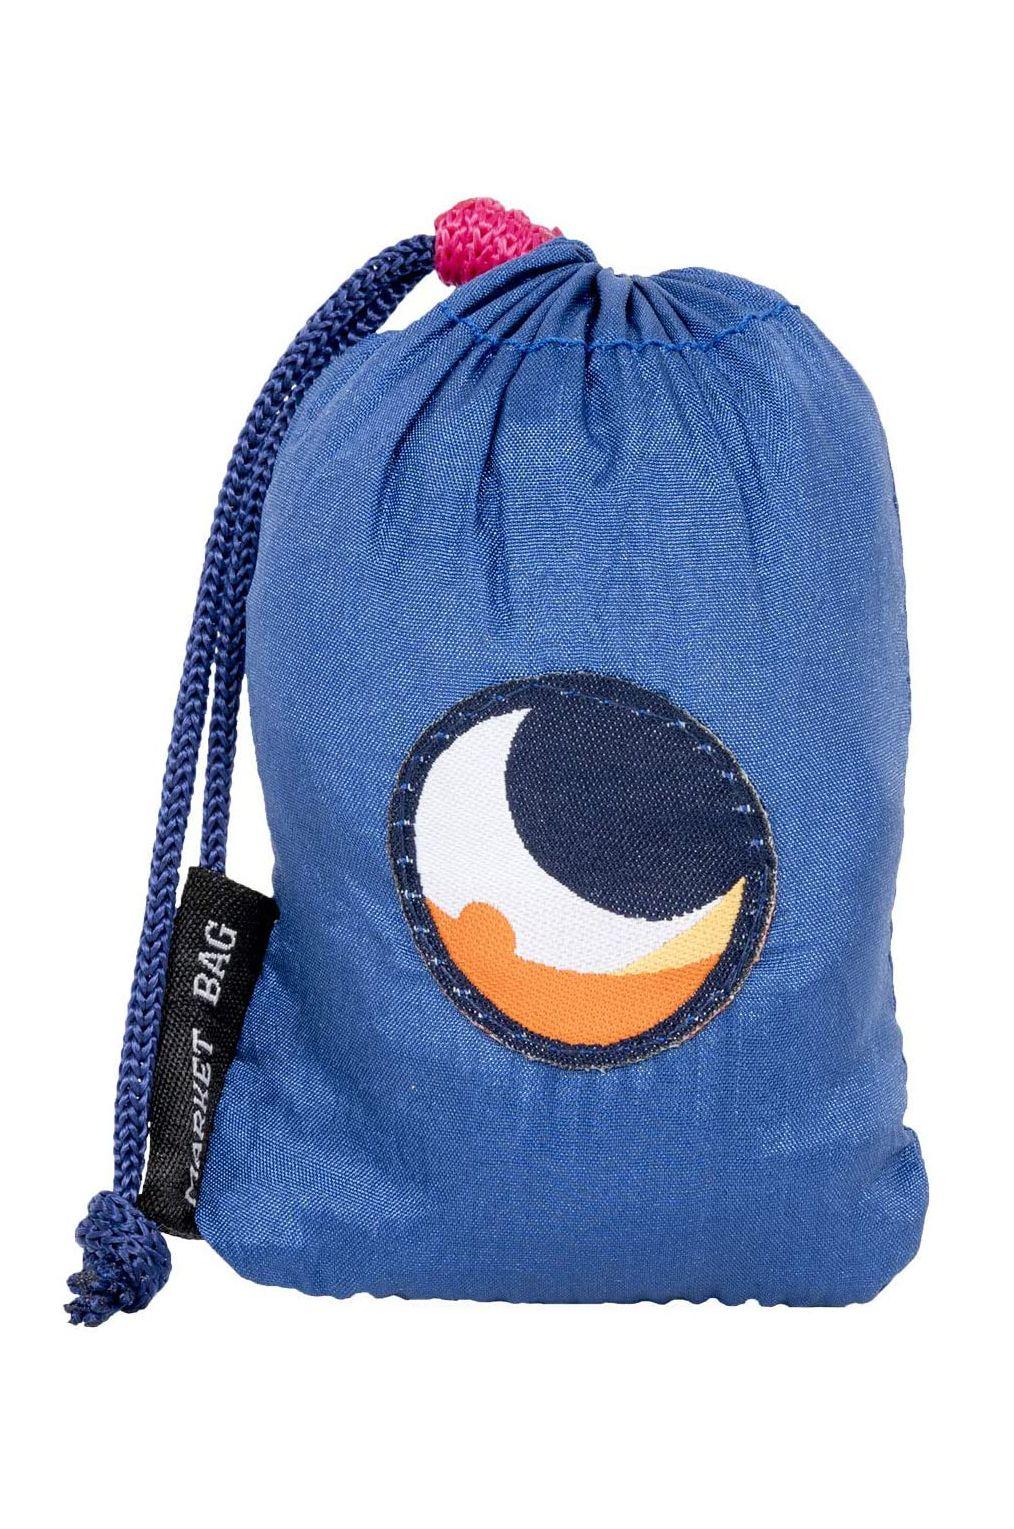 Ticket To The Moon Bag ECO BAG MEDIUM Royal Blue/Pink